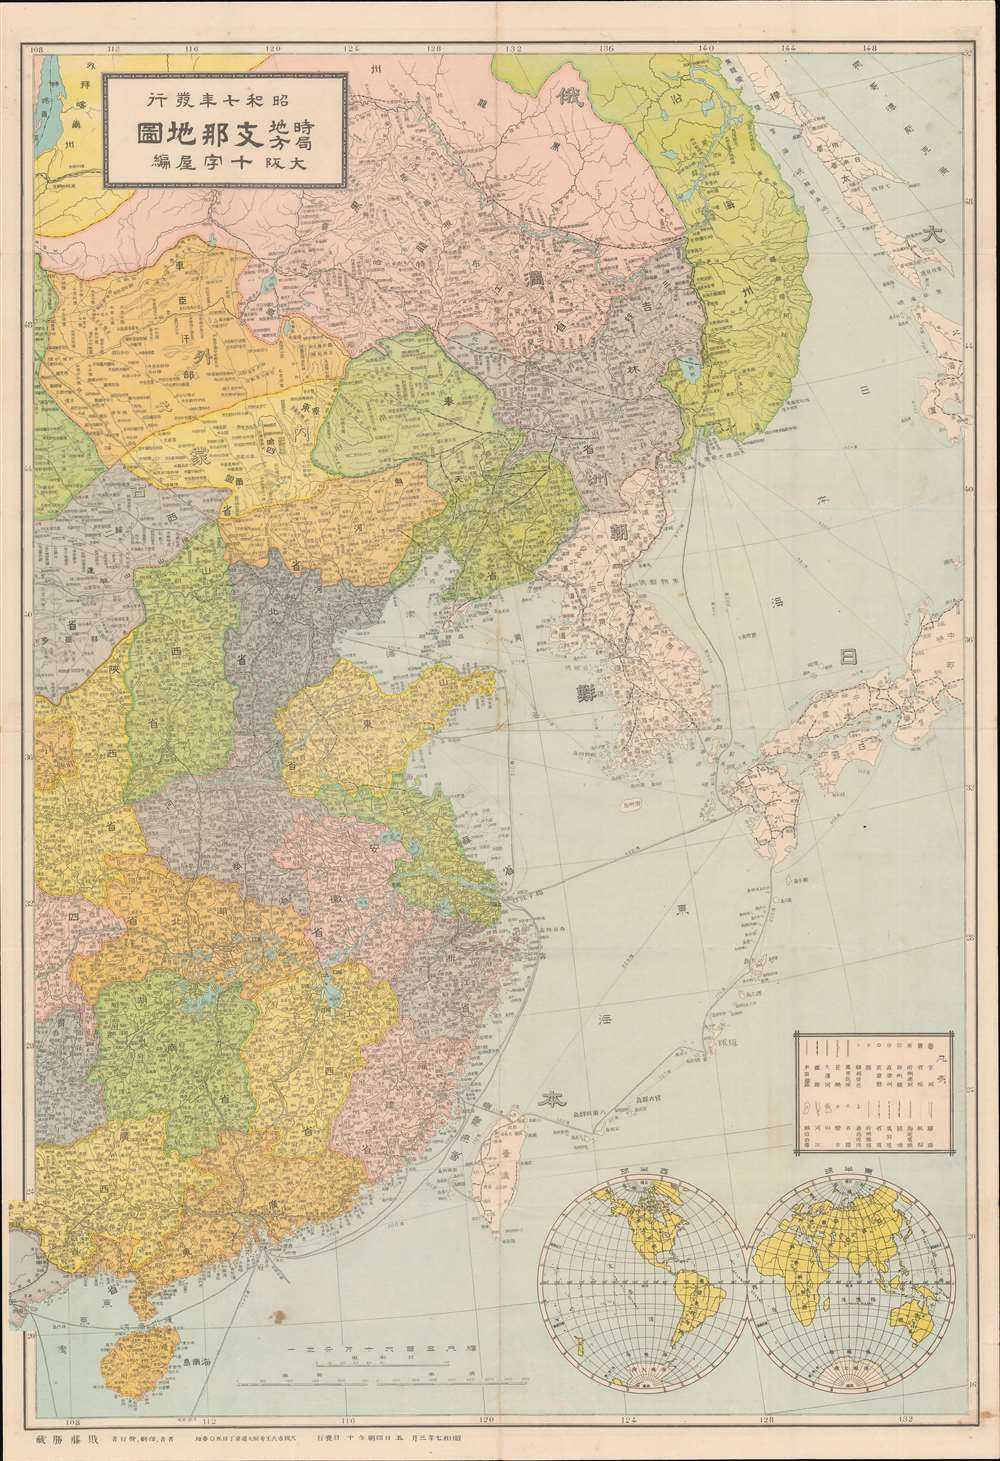 Shanghai New Map. / 上海新地圖 - Alternate View 1